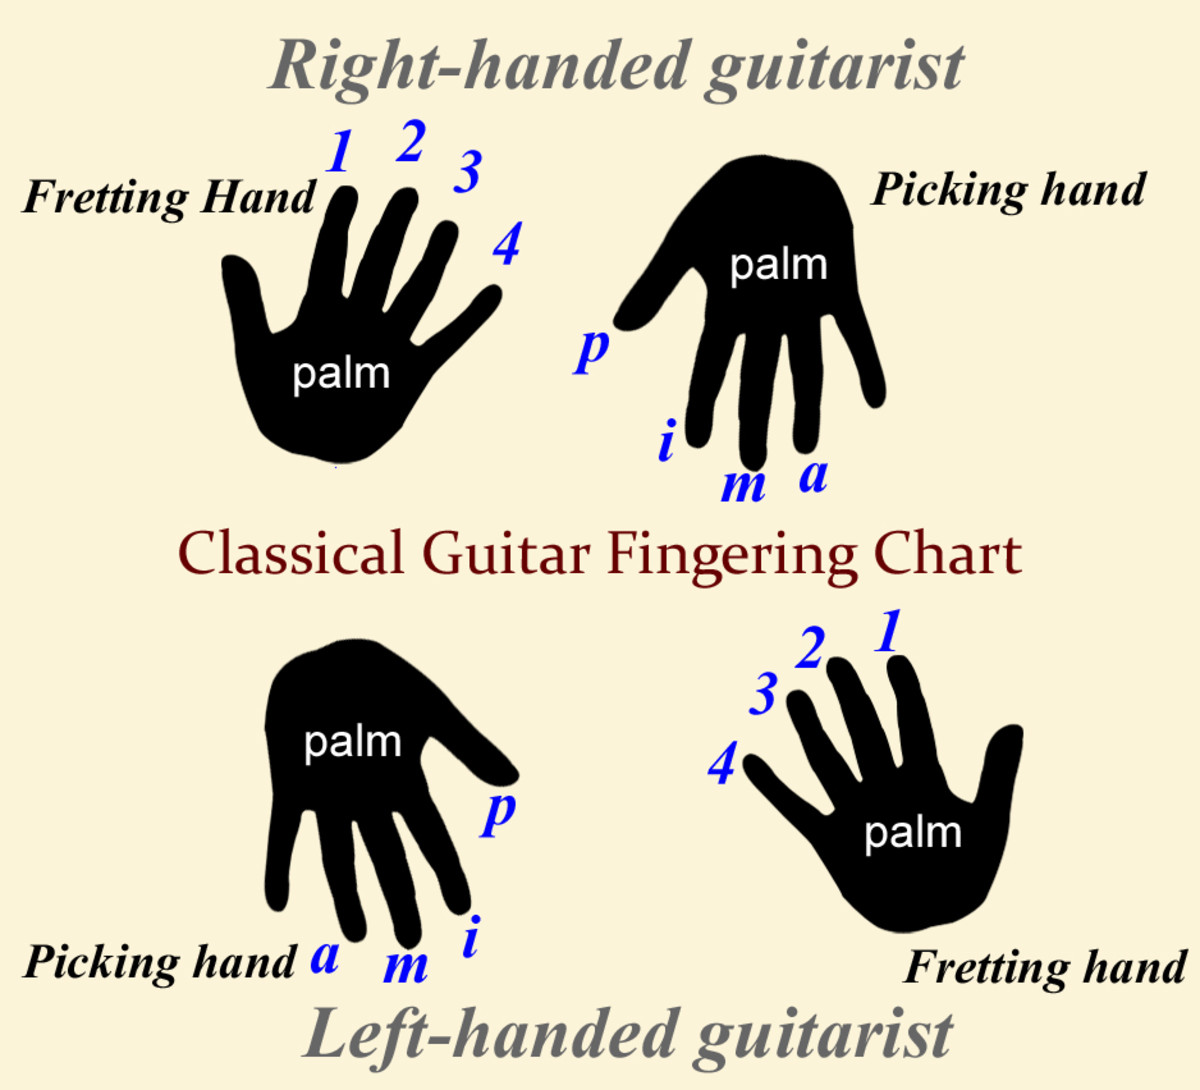 Classical guitar fingering chart